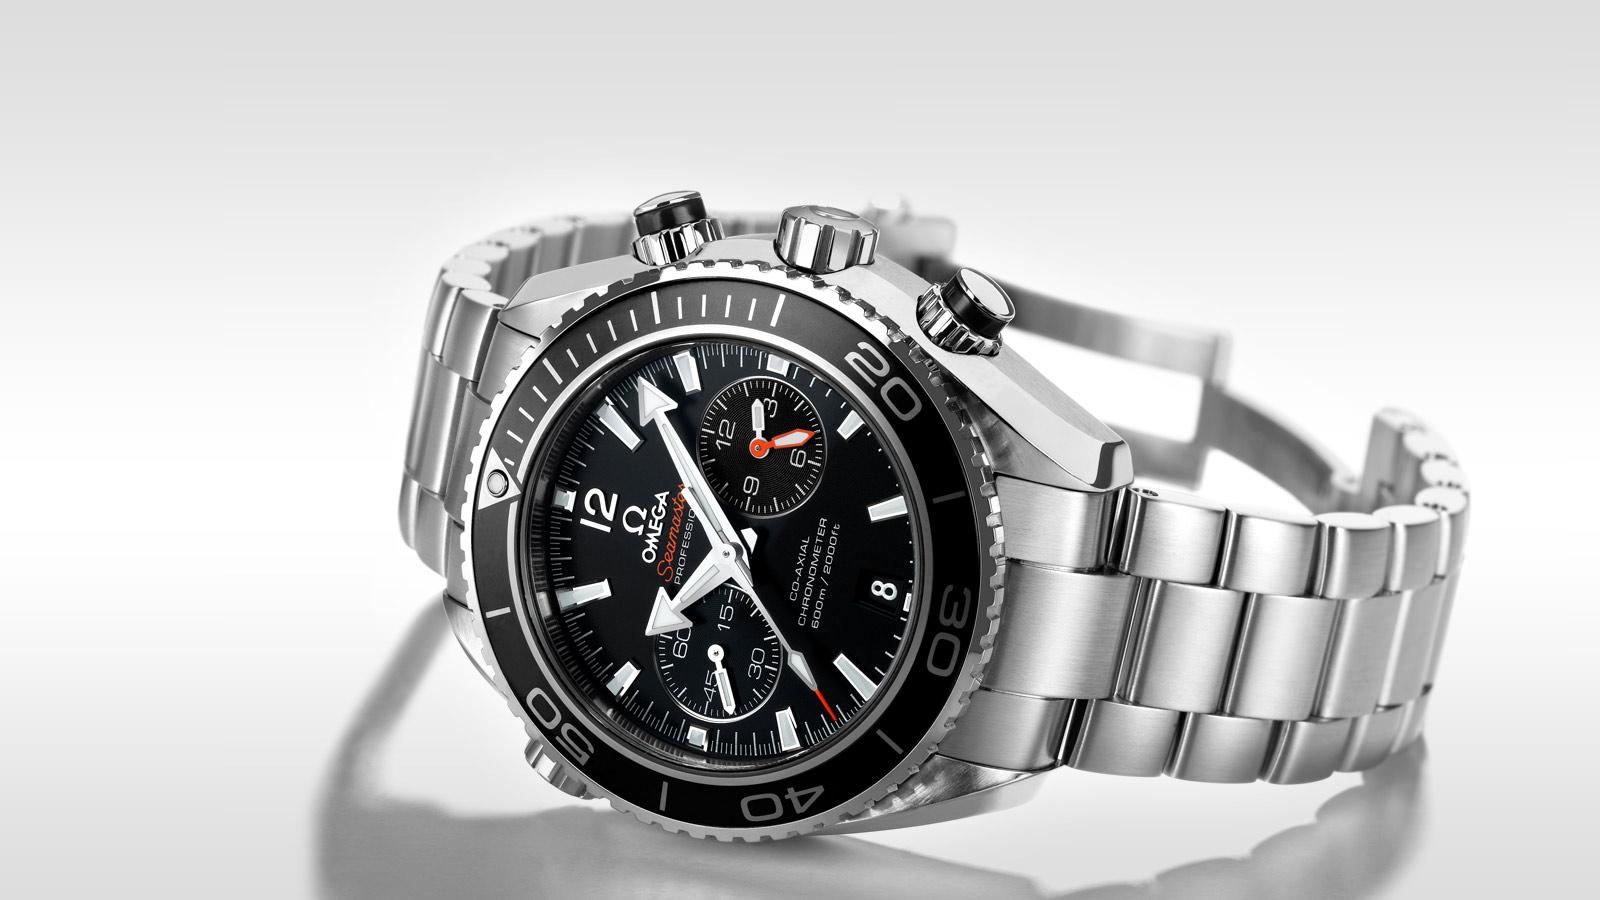 Omega Planet Ocean 600m Chrono Edinburgh Watch Company